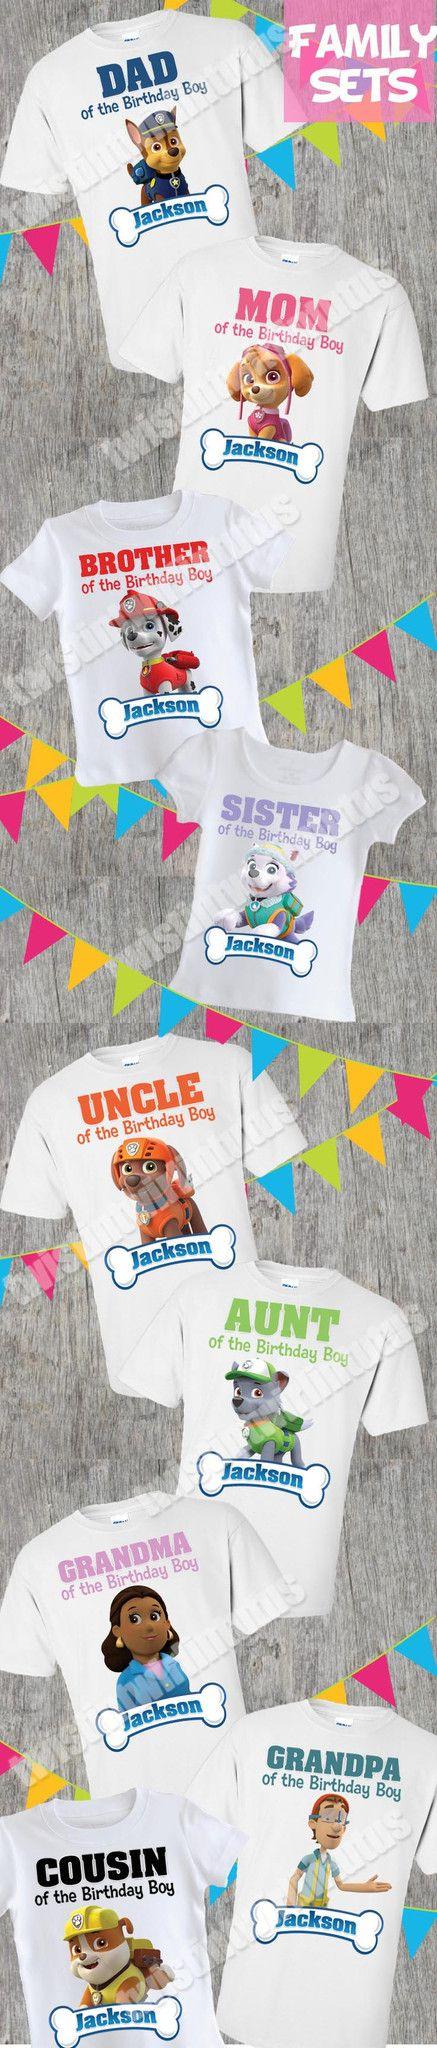 Paw Patrol Family Shirts | Paw Patrol Birthday Shirt | Paw Patrol Birthday Party Ideas | Paw Patrol Birthday | Birthday Party Ideas for Girls | Birthday Party Ideas for Boys | Twistin Twirlin Tutus #pawpatrolbirthday